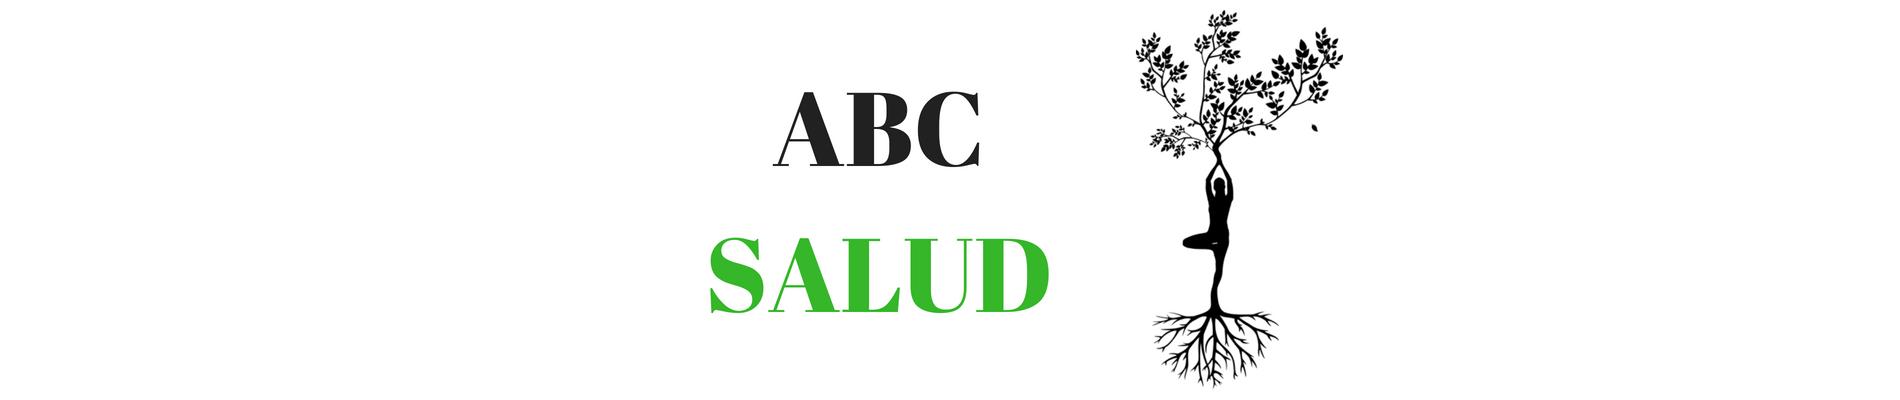 ABC Salud